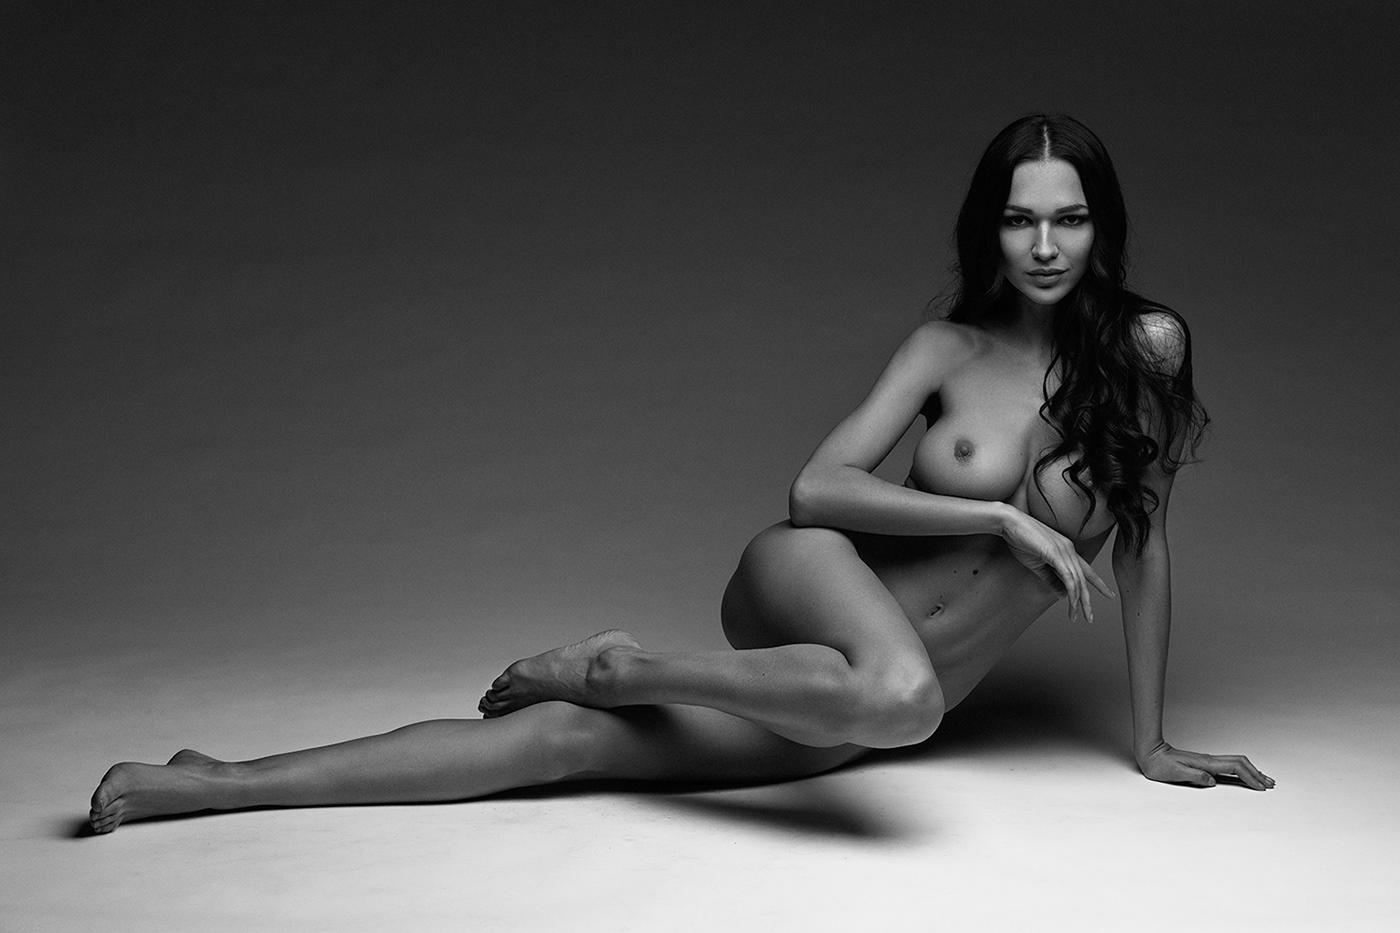 Анастасия Марципанова / фотограф Joakim Karlsson